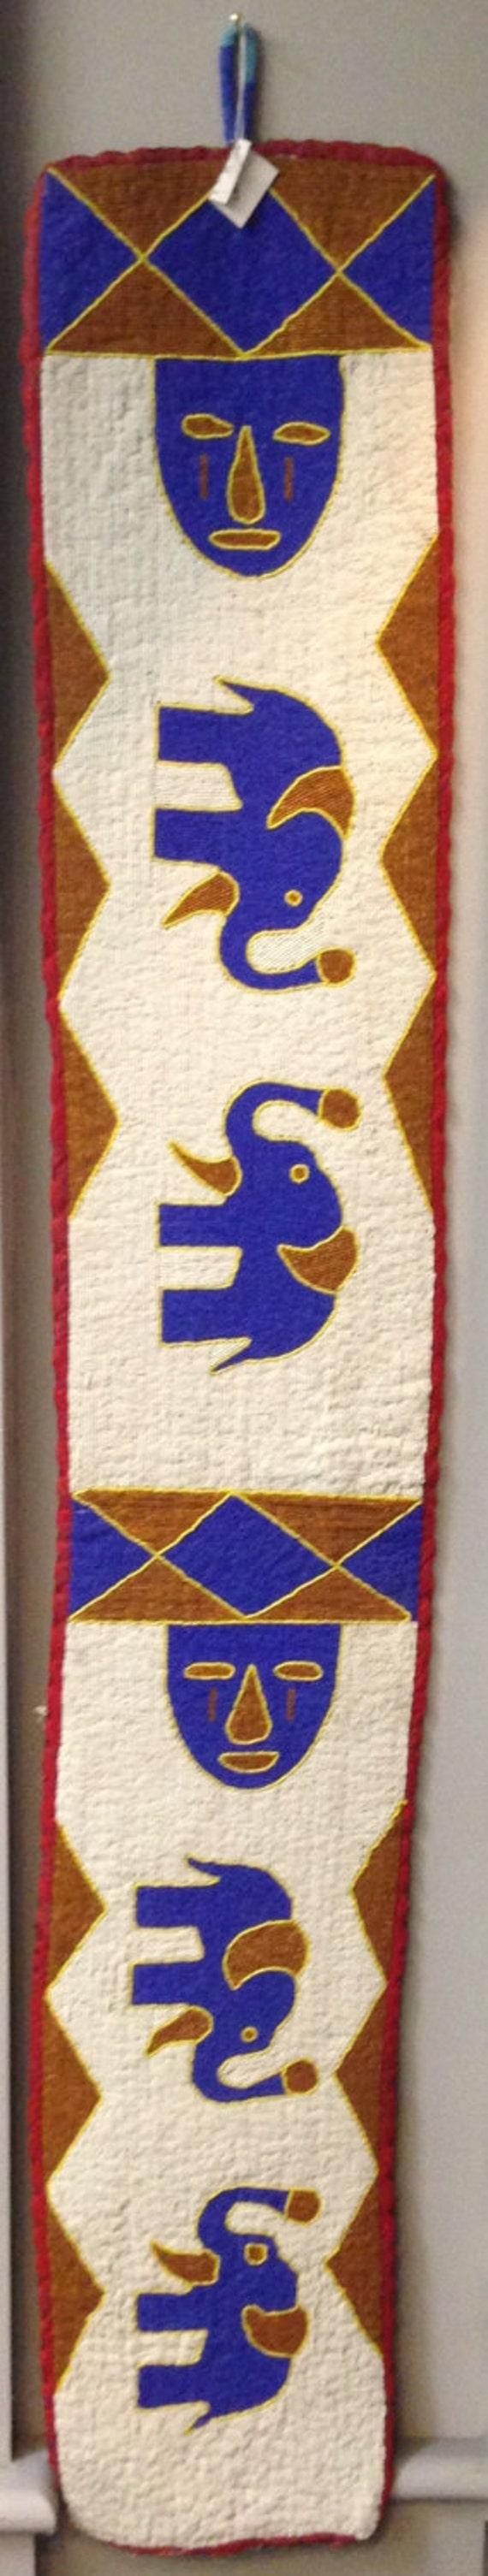 Belt Yoruba Hand Beaded Diviner Belts Nigeria Sash Handmade Red Blue Beaded Belts Diviner Belt Faces Animals Ceremonial Belt Home  Decor